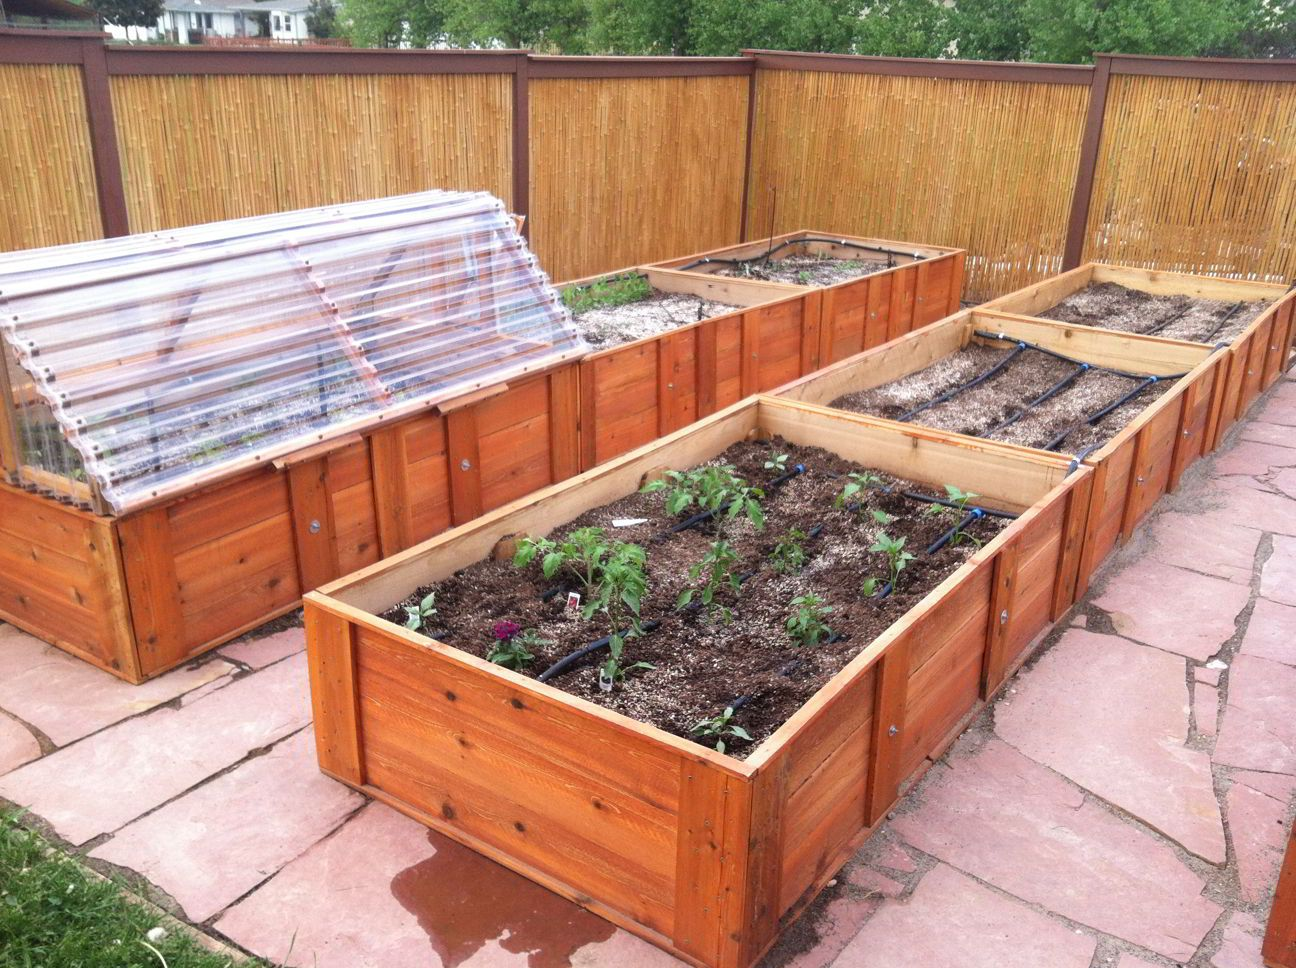 Raised cedar box garden with attached cold frame drip irrigation